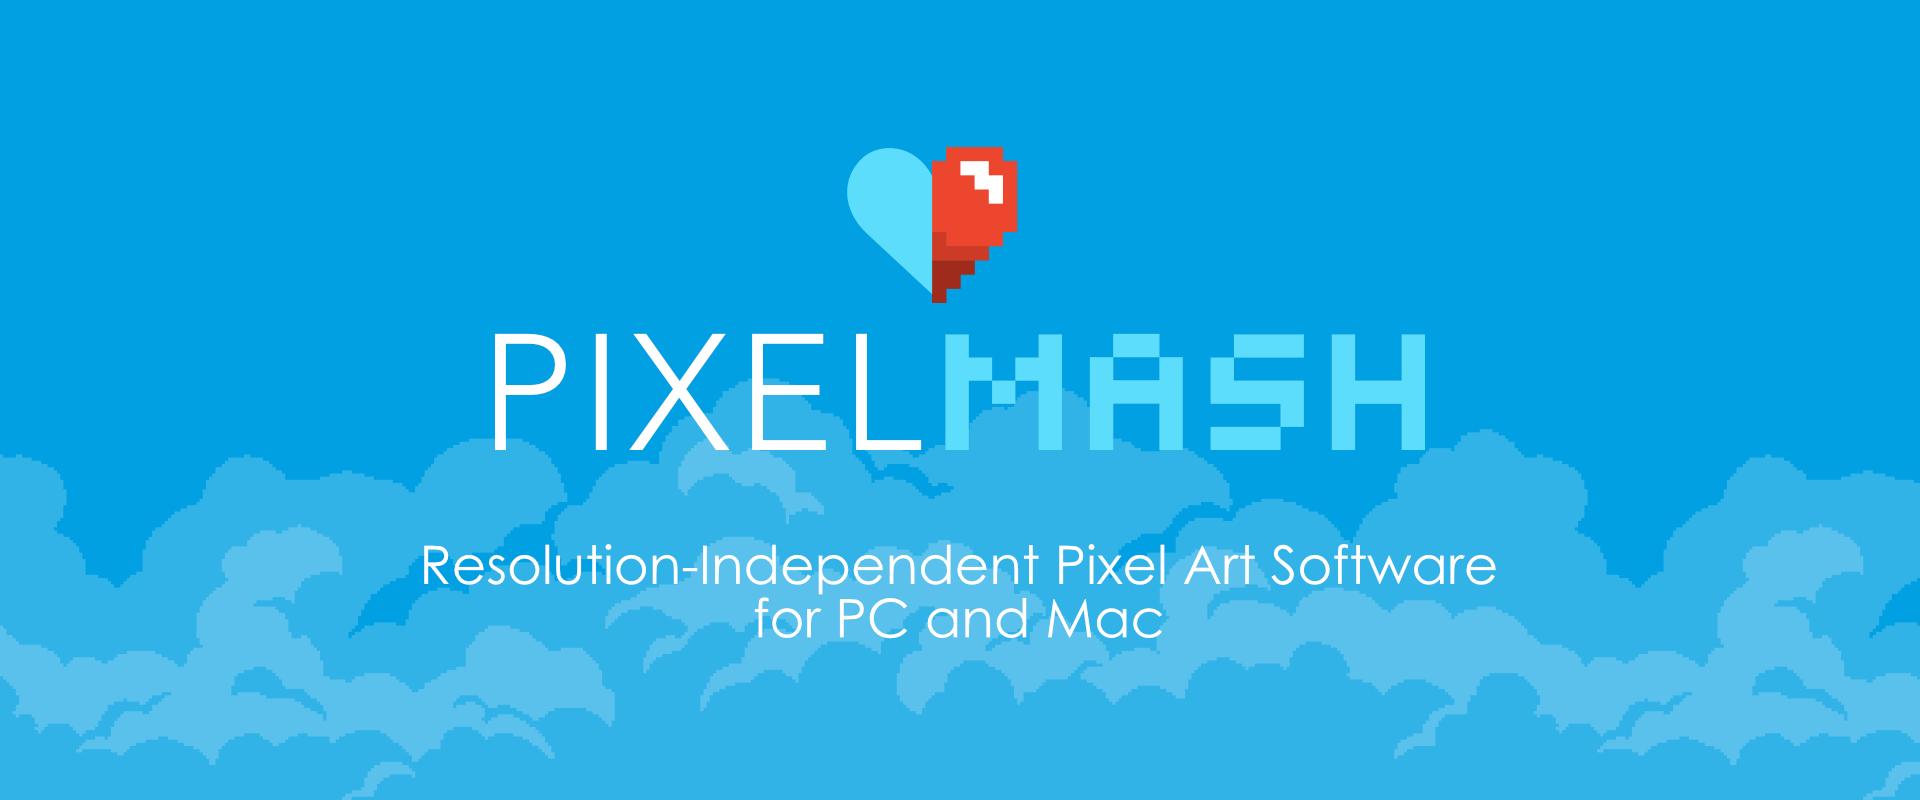 Pixelmash - Resolution-Independent Pixel Art